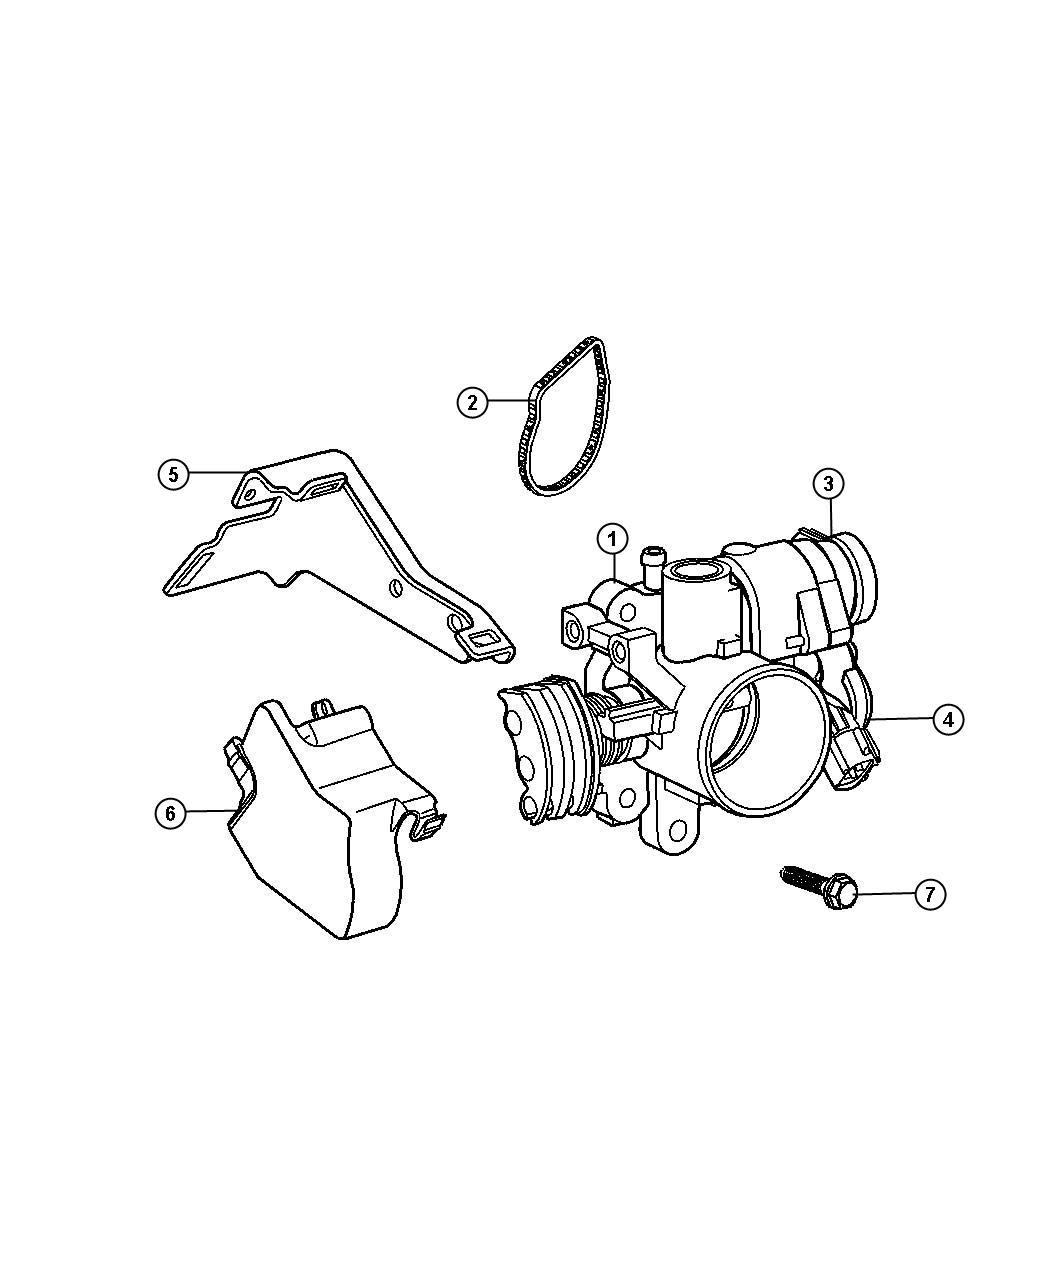 Plymouth Breeze Sensor. Throttle position. Smpiengine